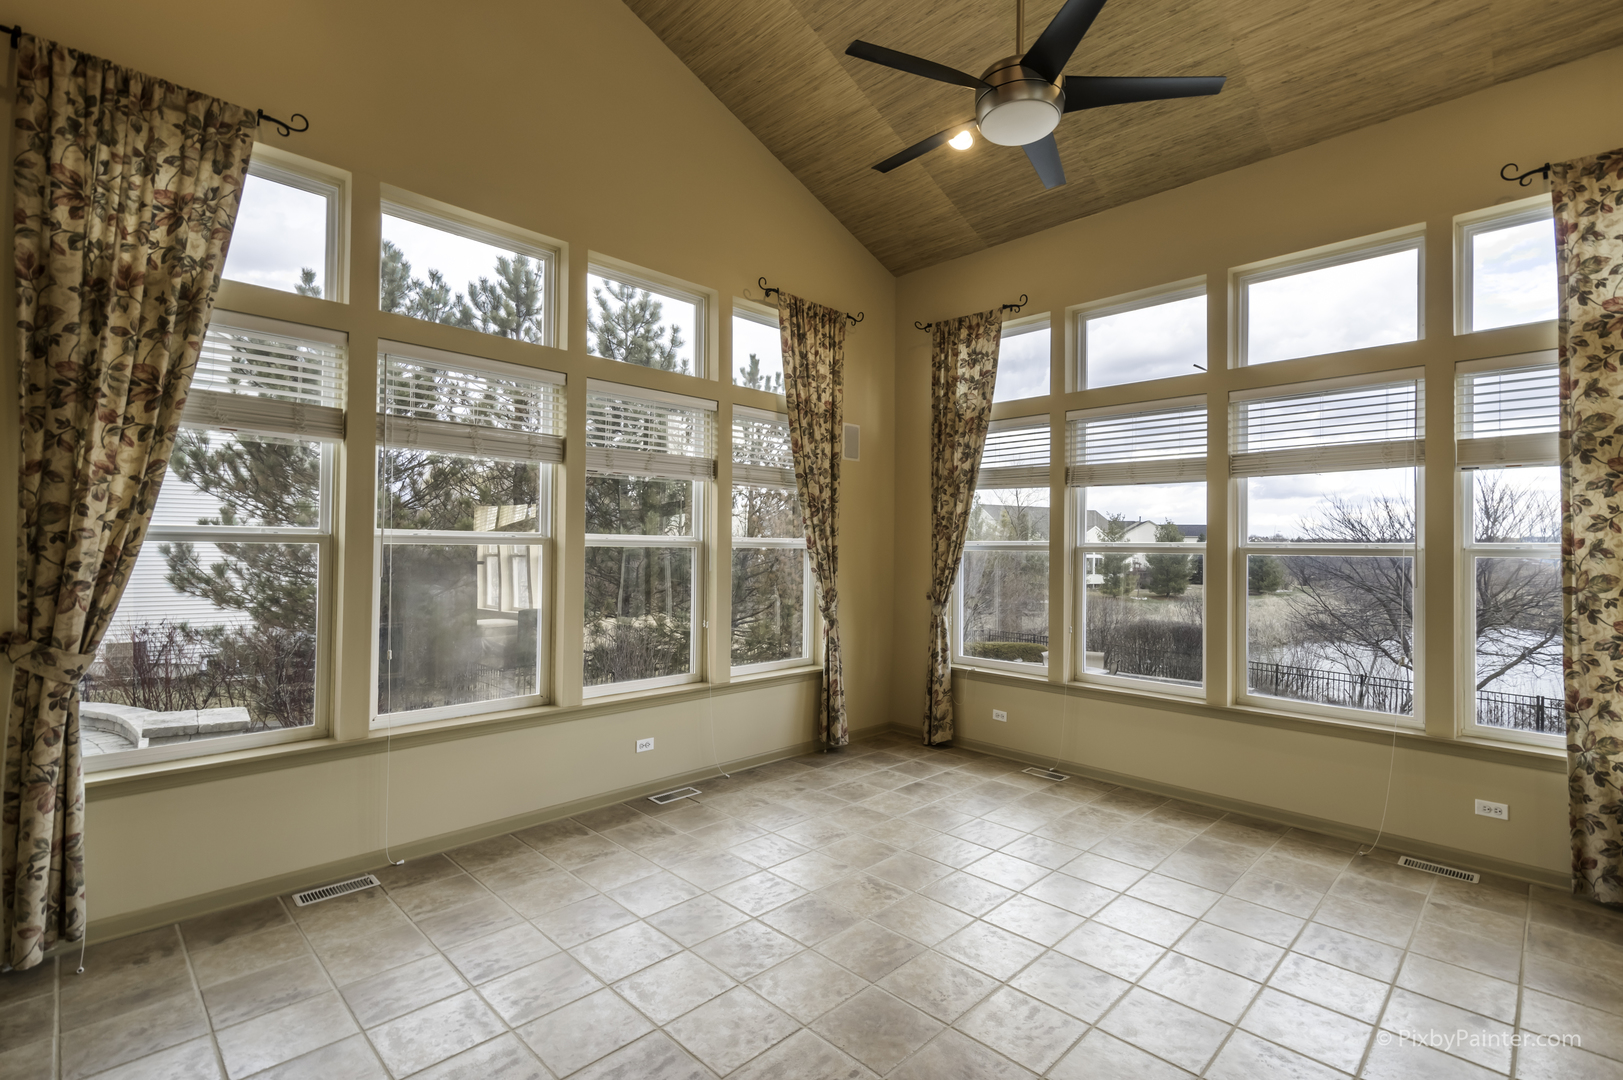 571 BROOKSIDE, ALGONQUIN, Illinois, 60102